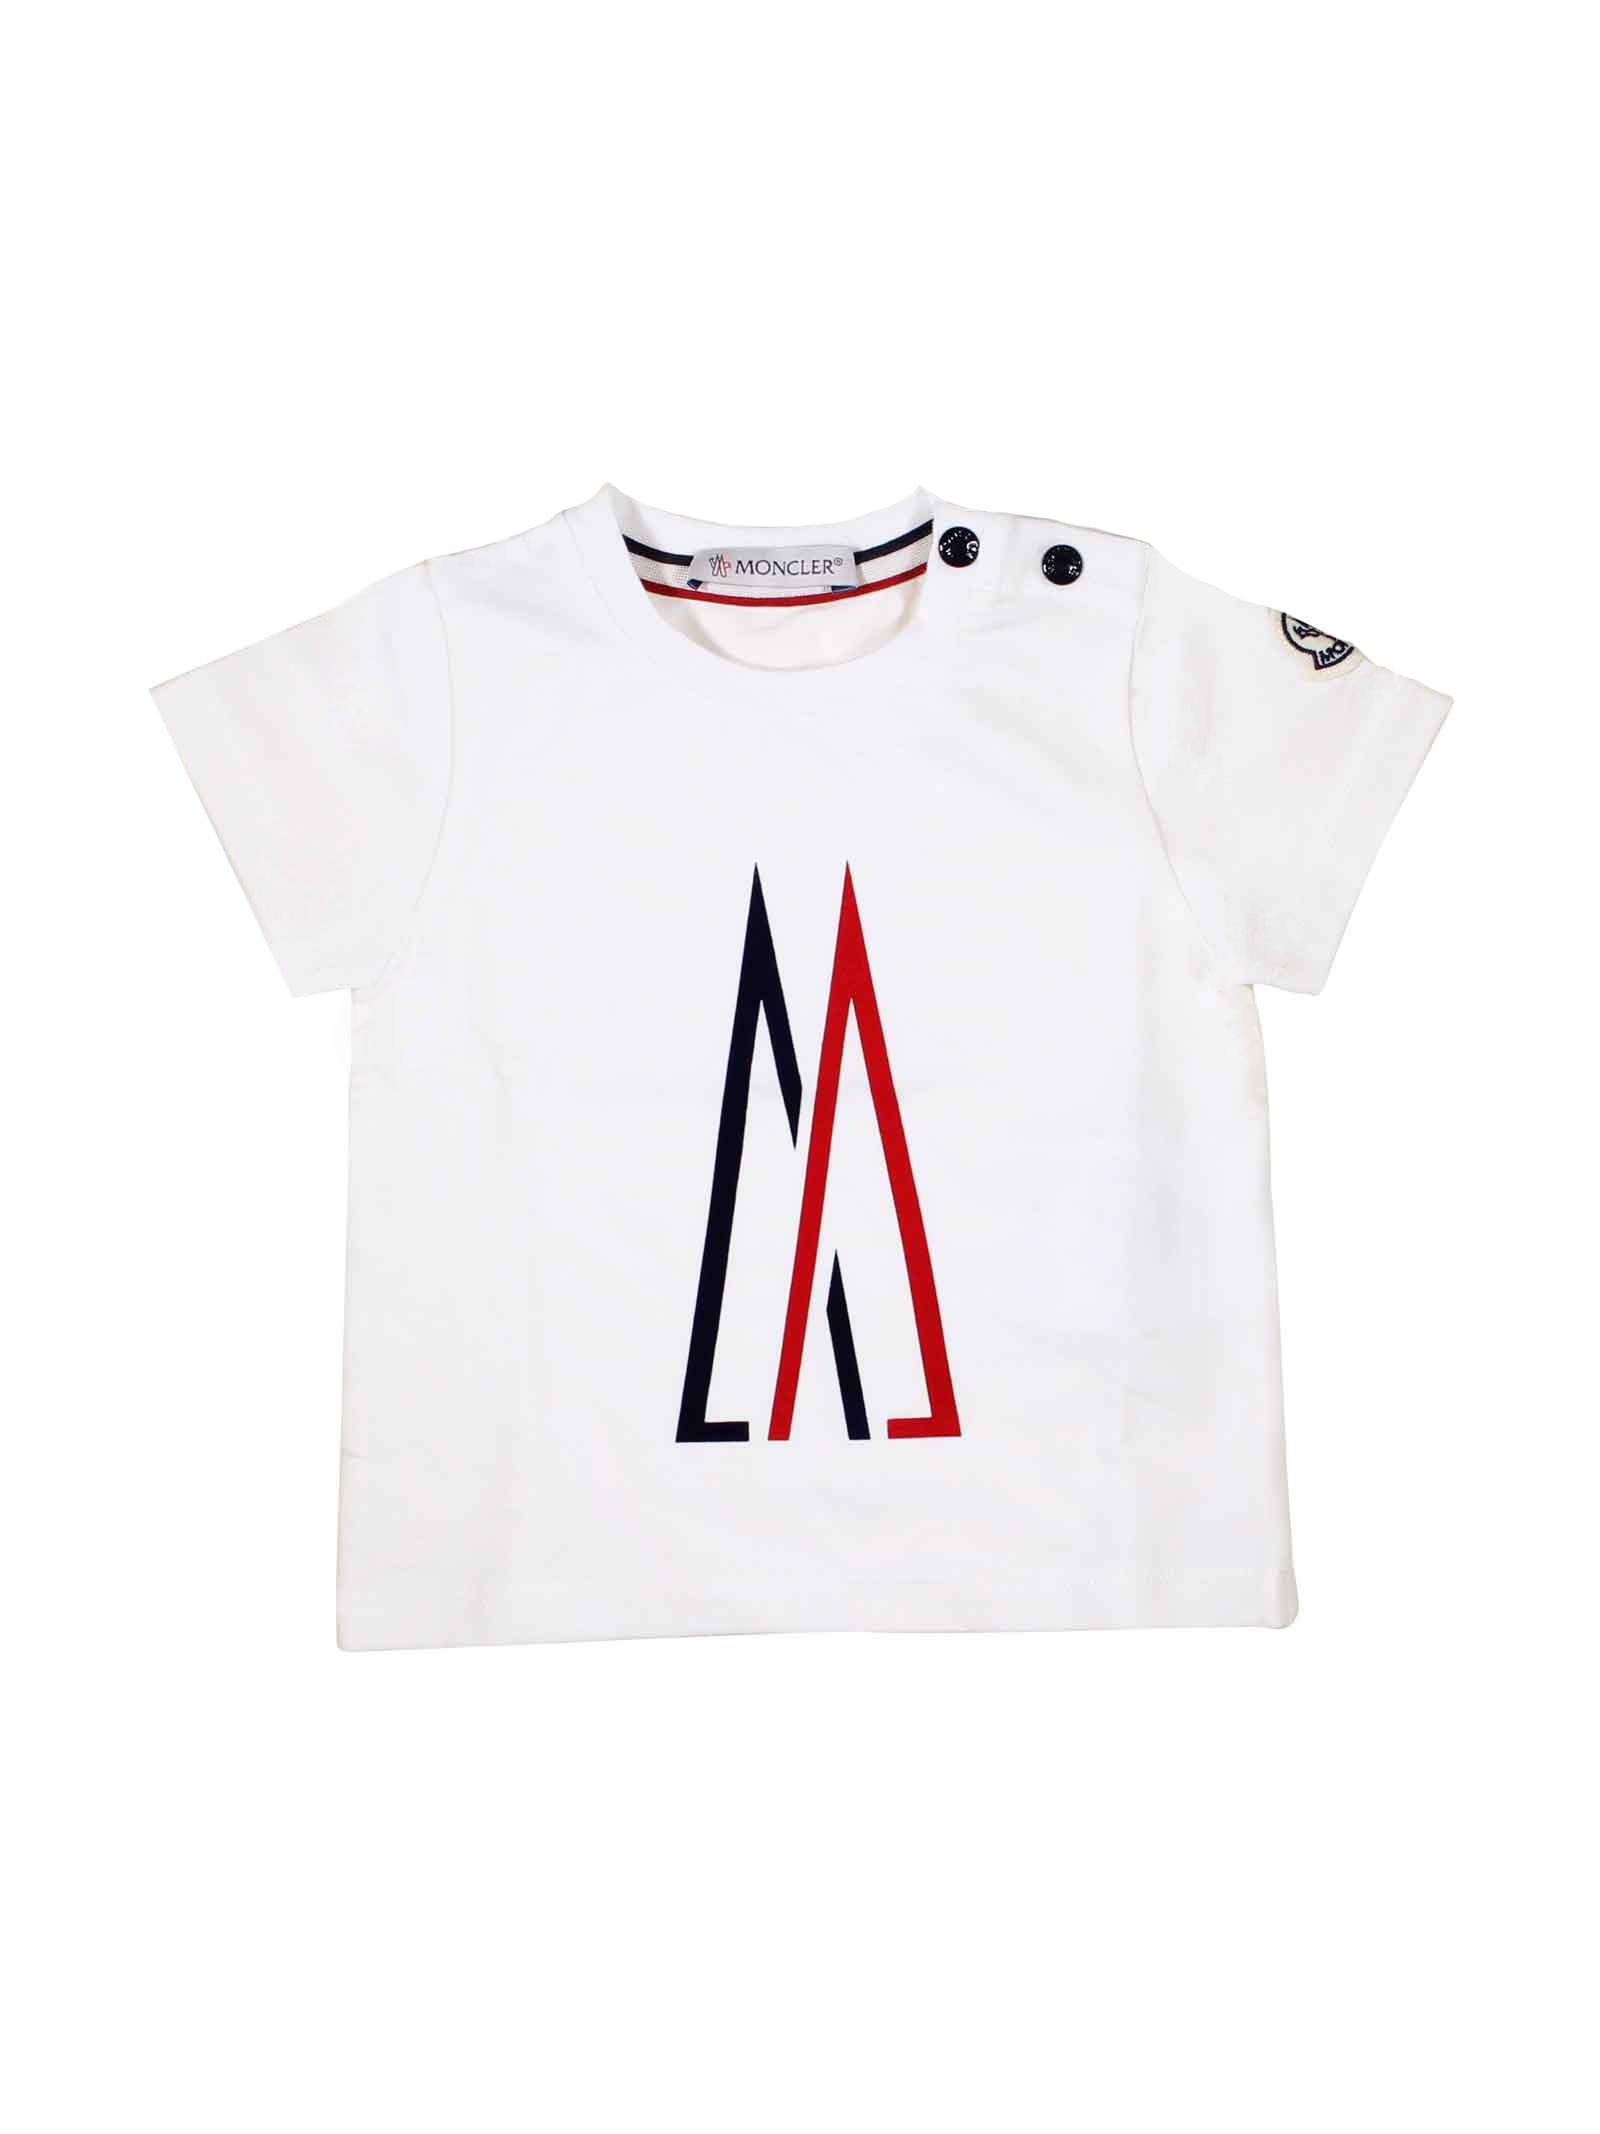 a9f99c97 ... MONCLER KIDS WHITE T-SHIRT FOR BOY Moncler Kids   8   8024750V8014034  ...